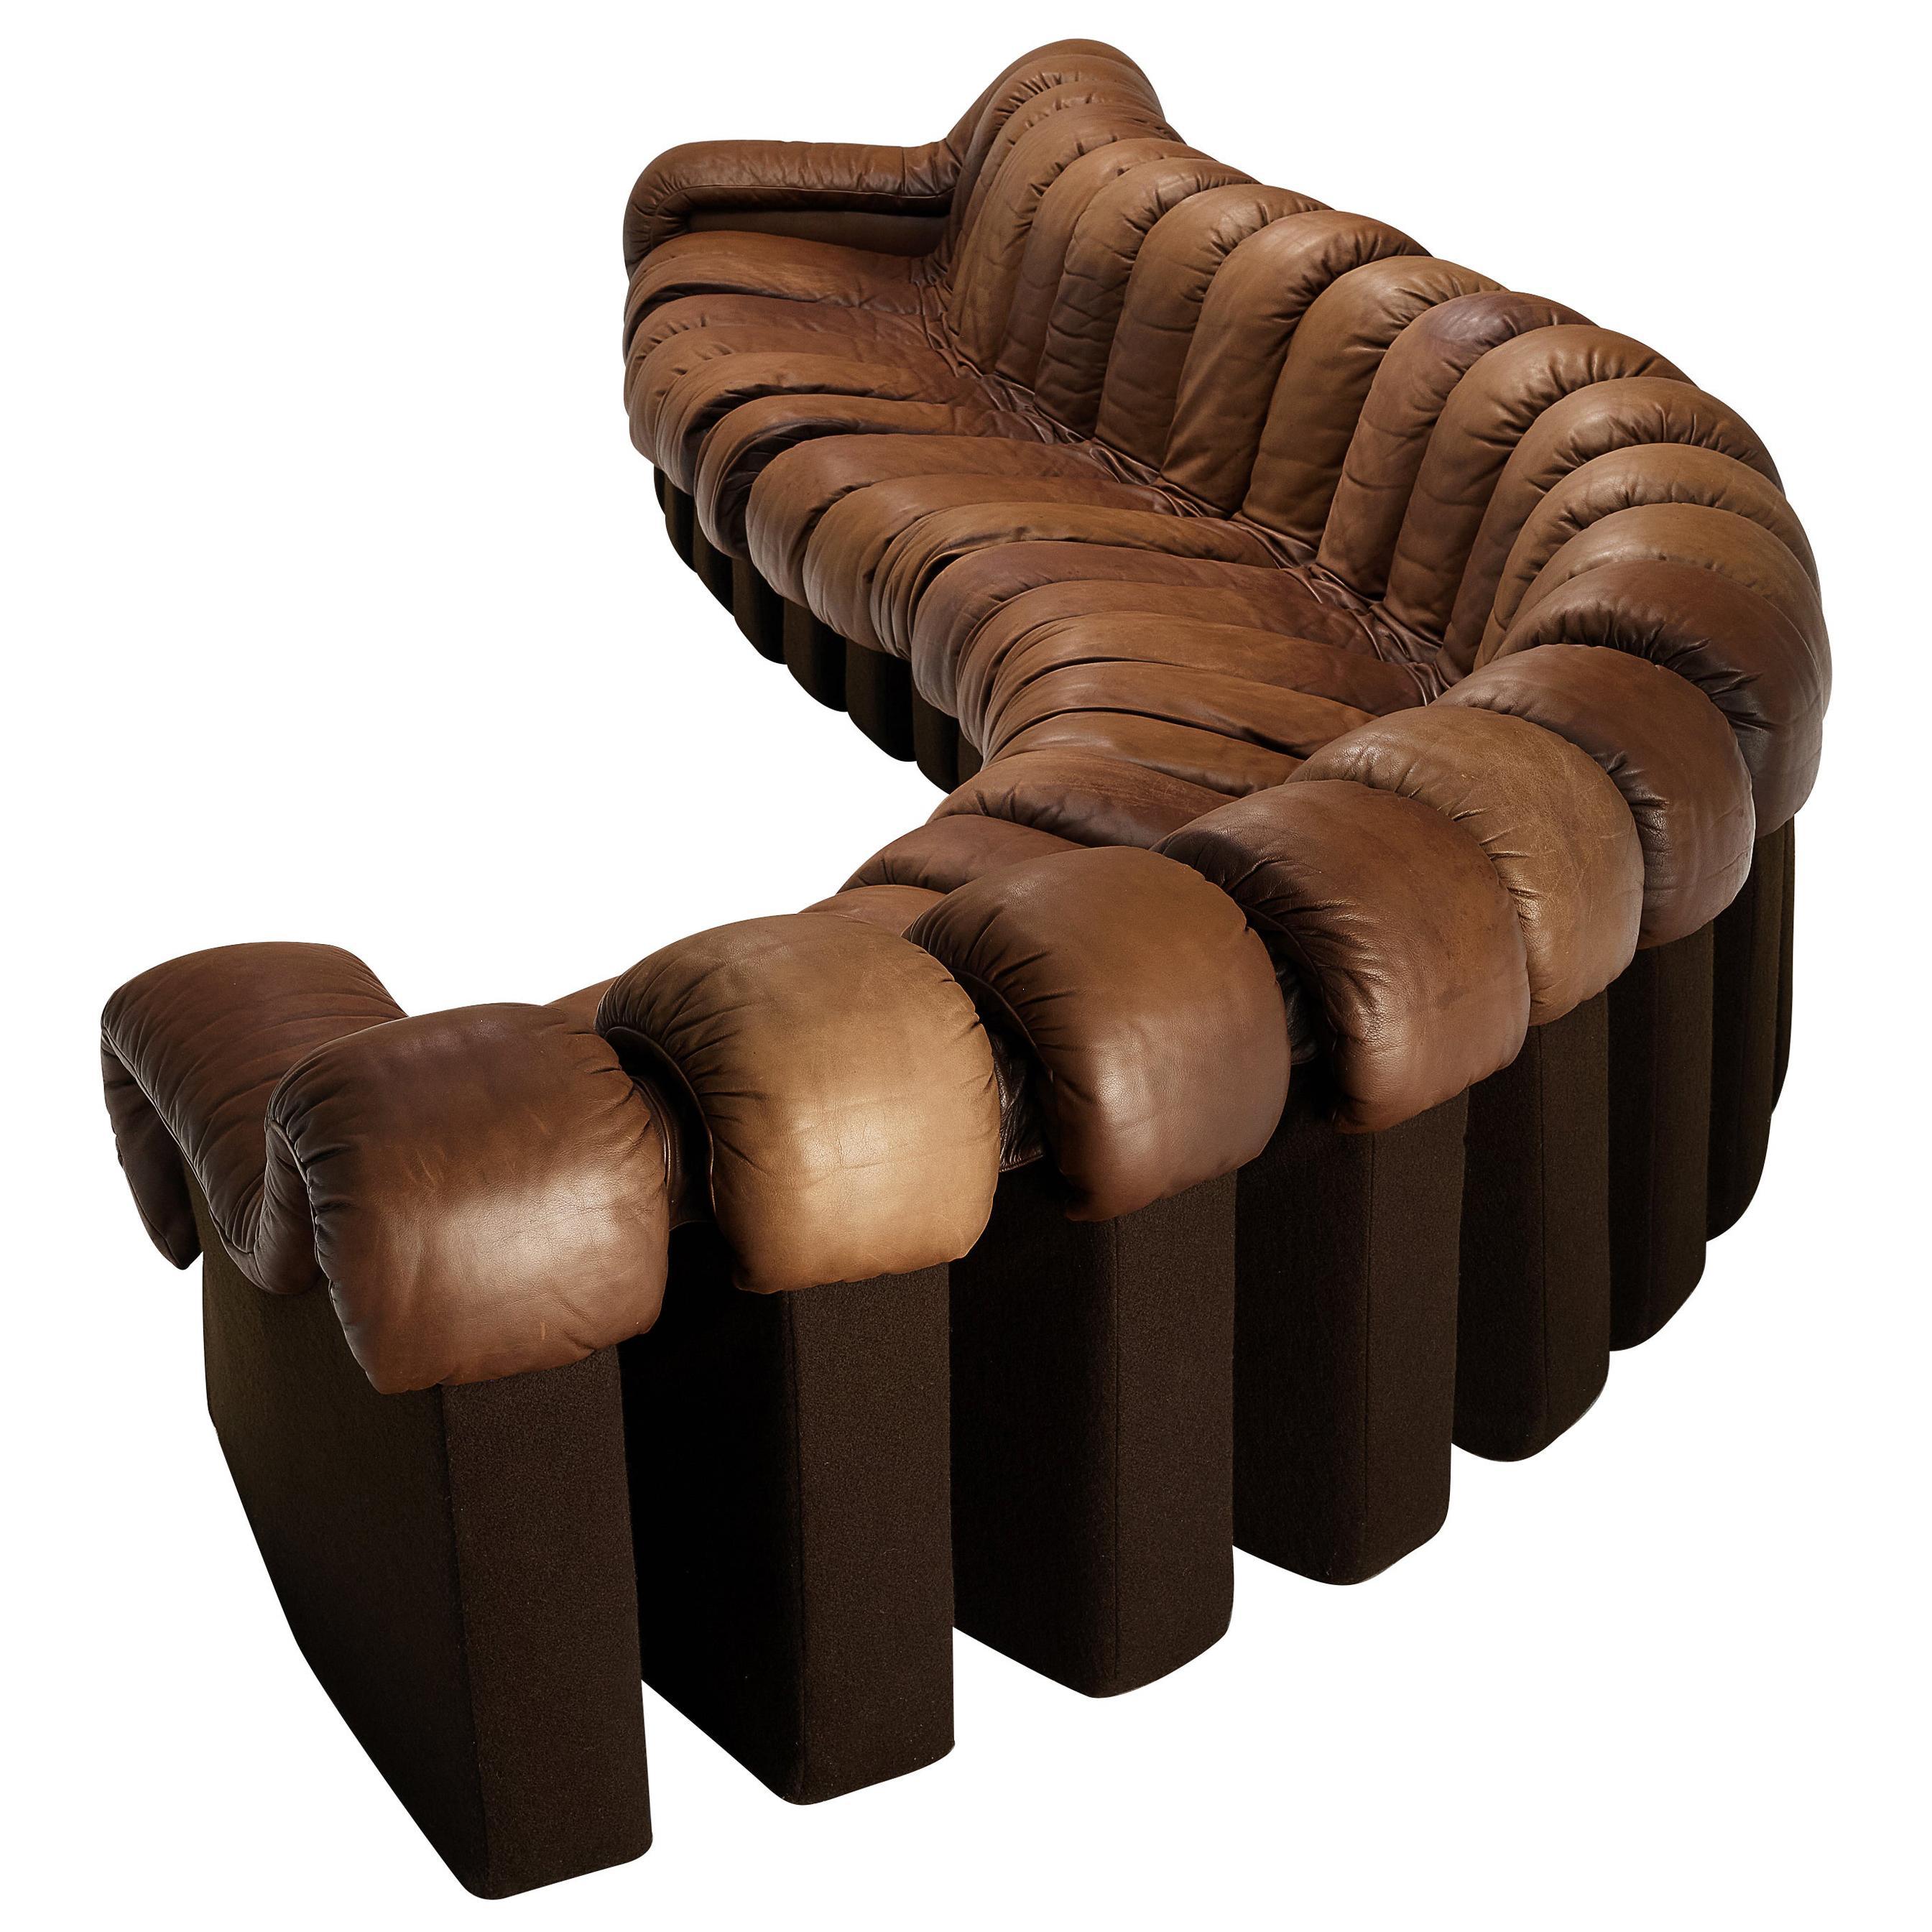 De Sede Sofa Model 'Snake DS-600' in Brown Leather